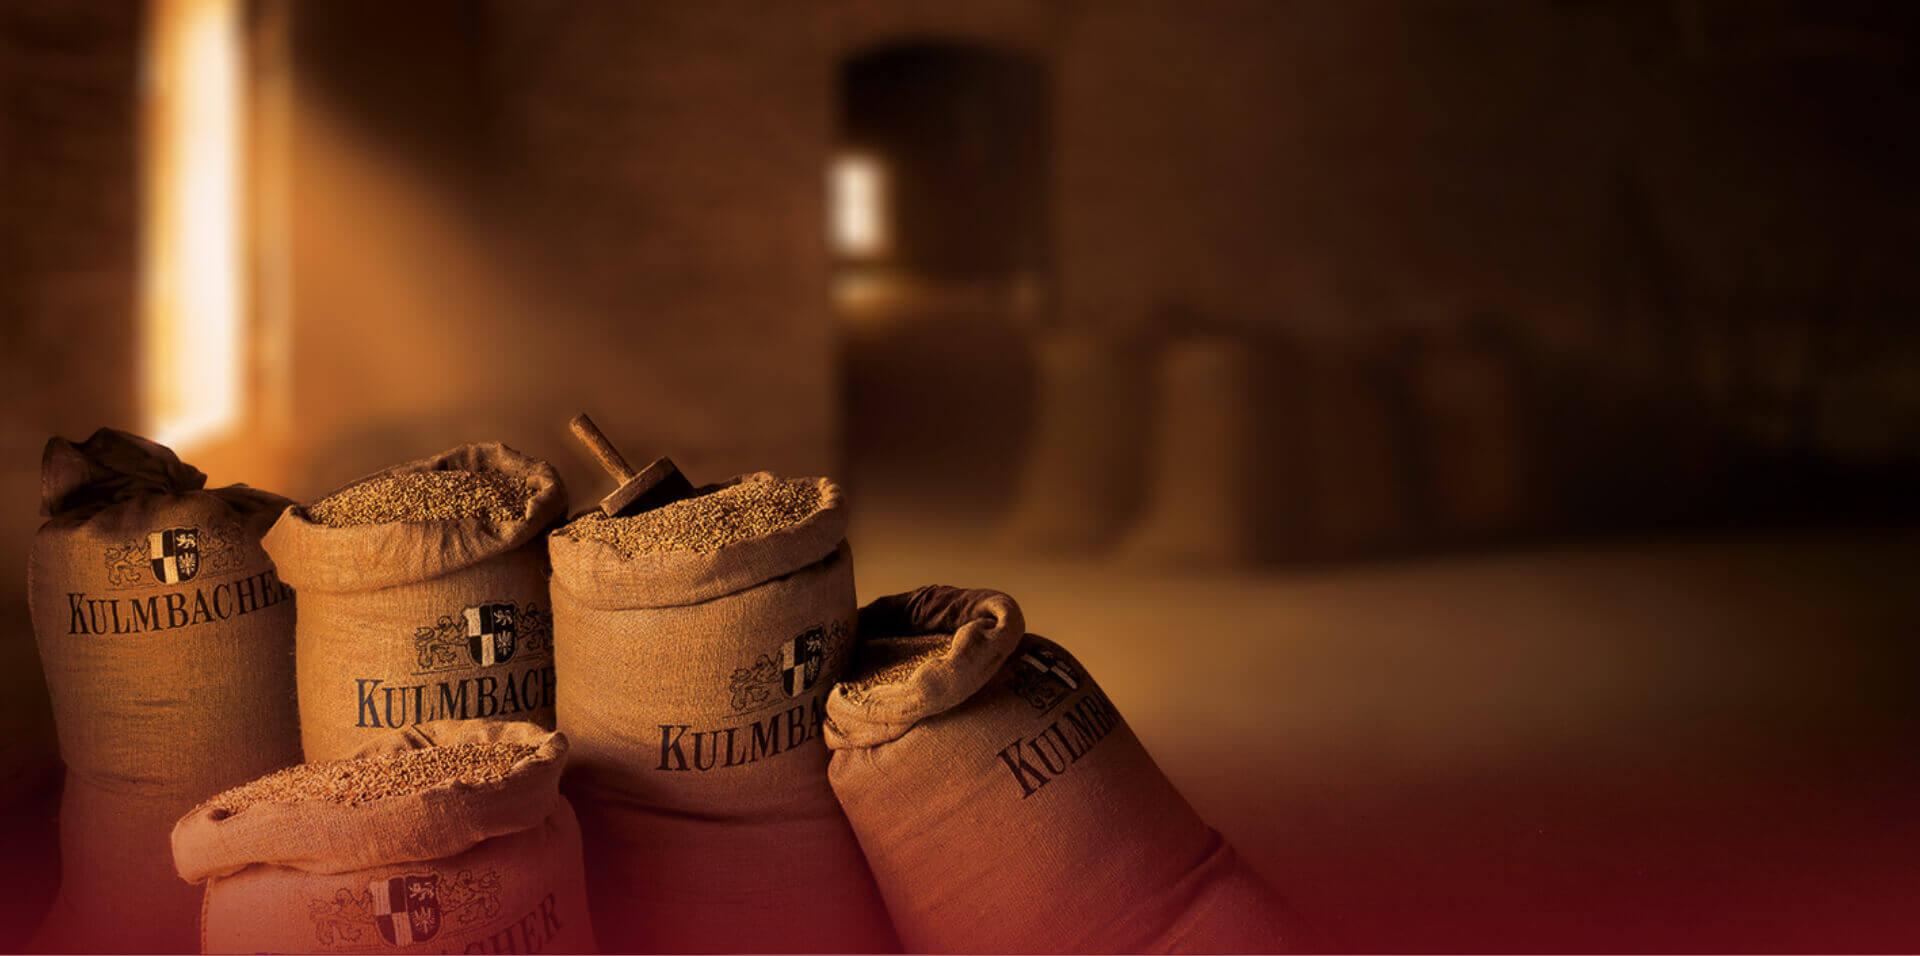 Traditions-Brauerei - Kulmbacher Edelherb